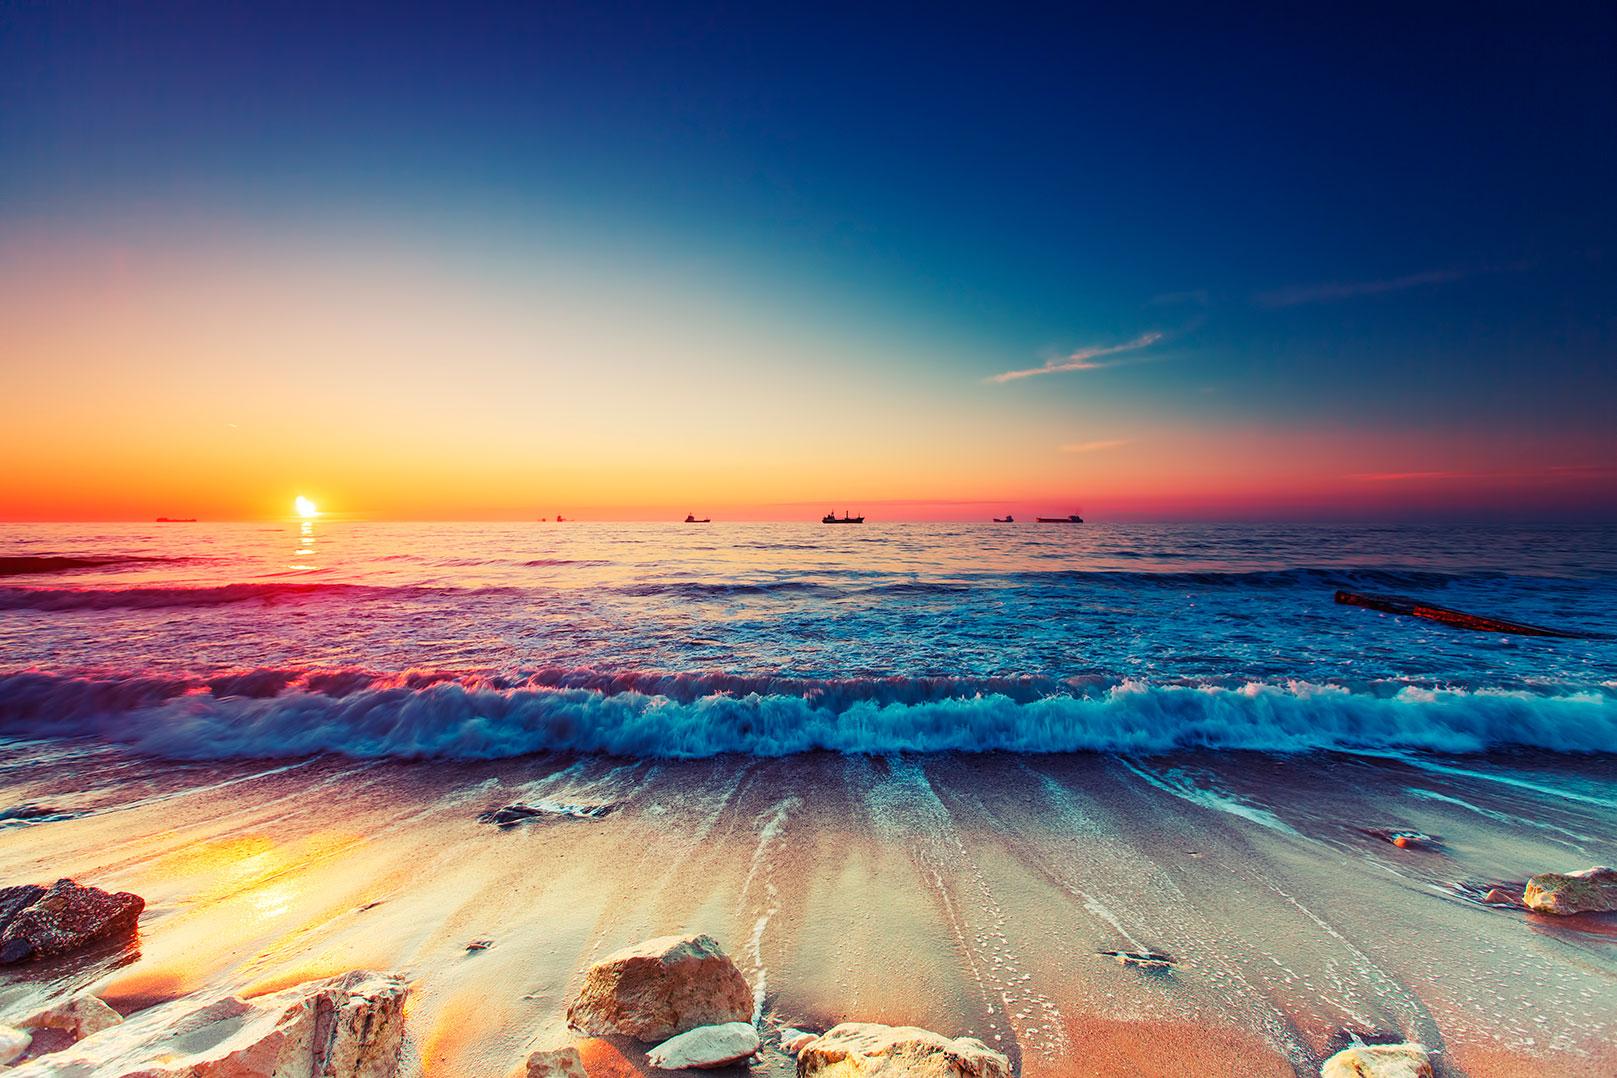 Cuadro atardecer en la playa bfl62374288 - Cuadros tenerife ...